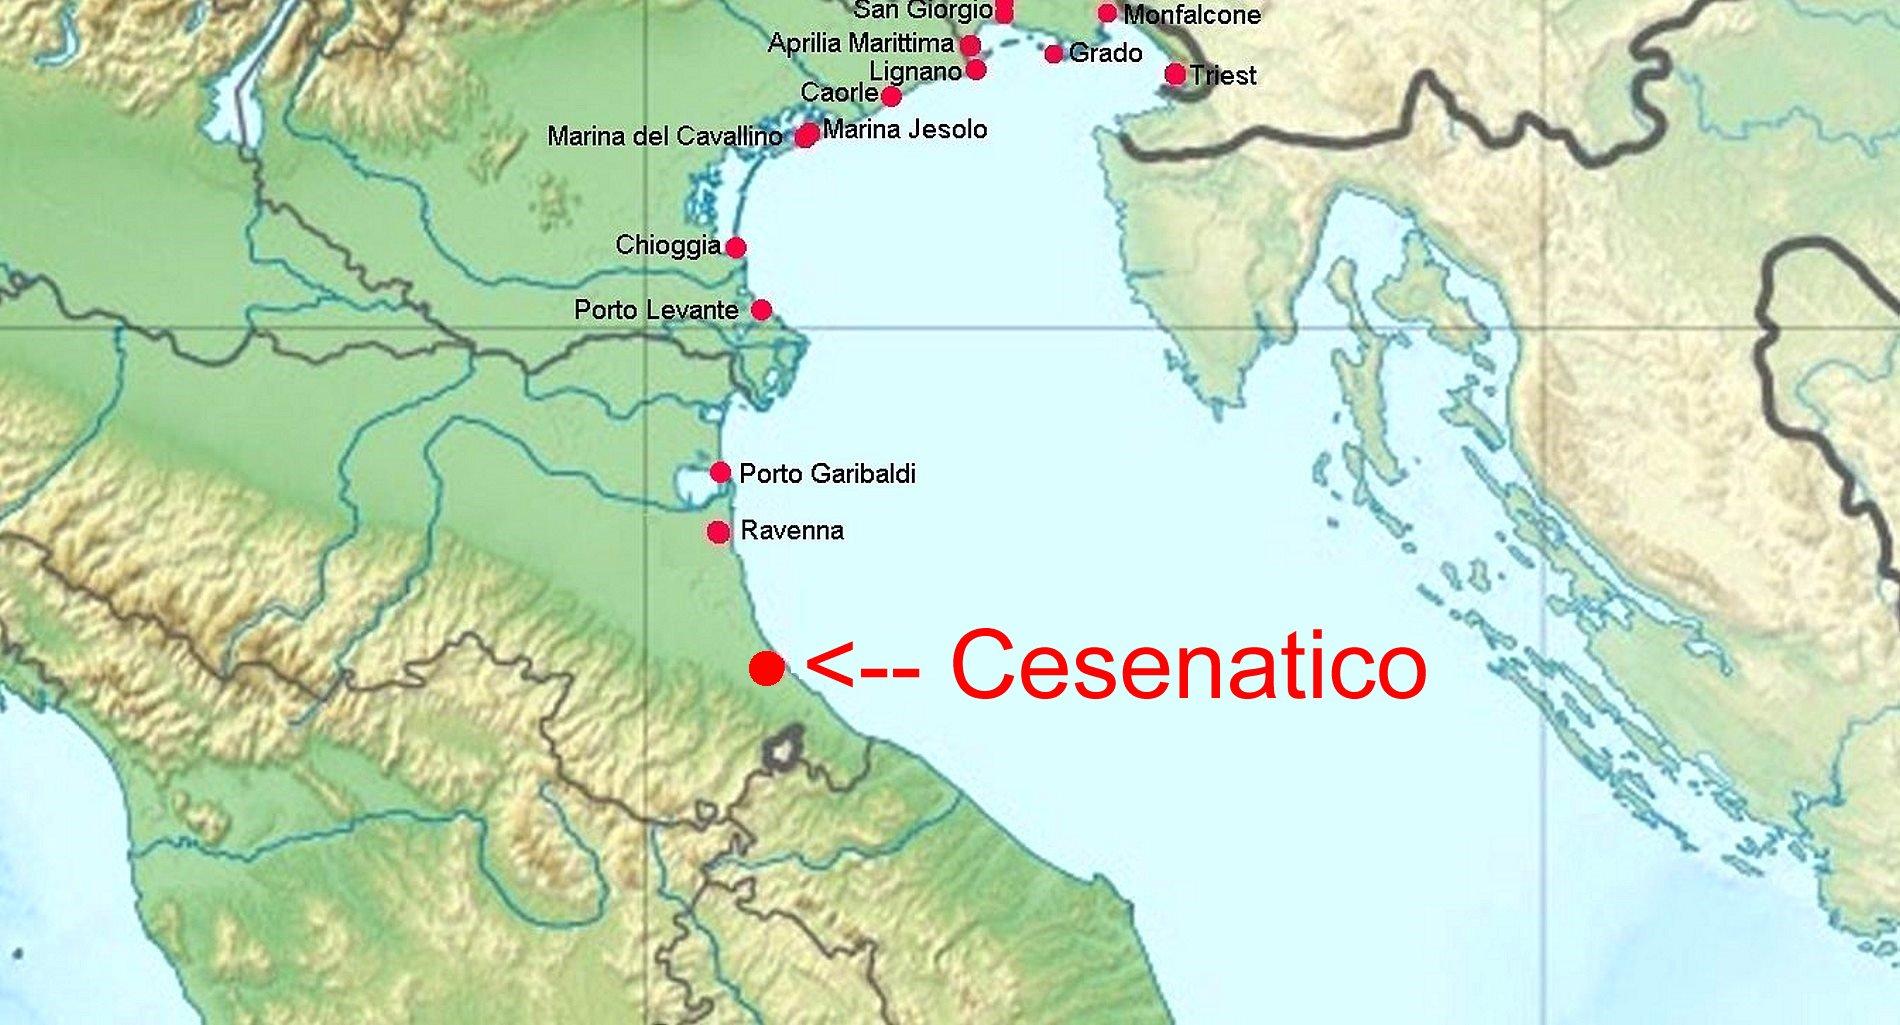 cesenatico karte italien Online Hafenhandbuch Italien: Onda Marina in Cesenatico